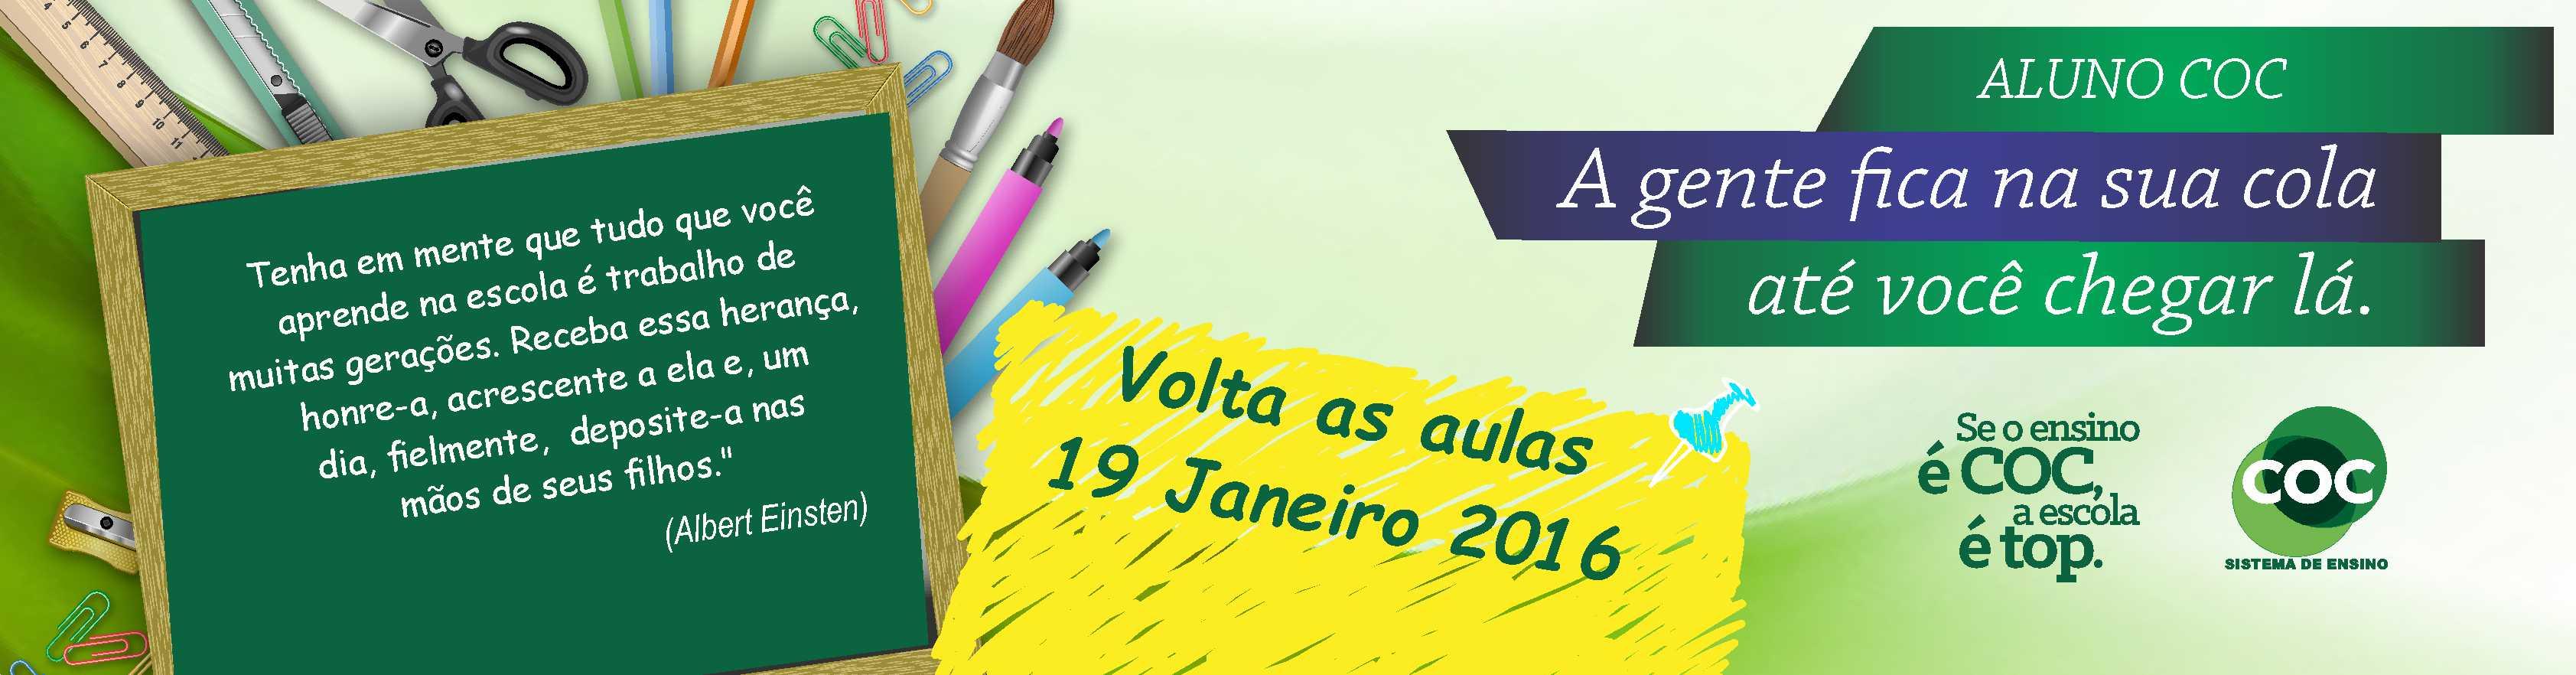 Volta-as-aulas-2016-banne-site-face